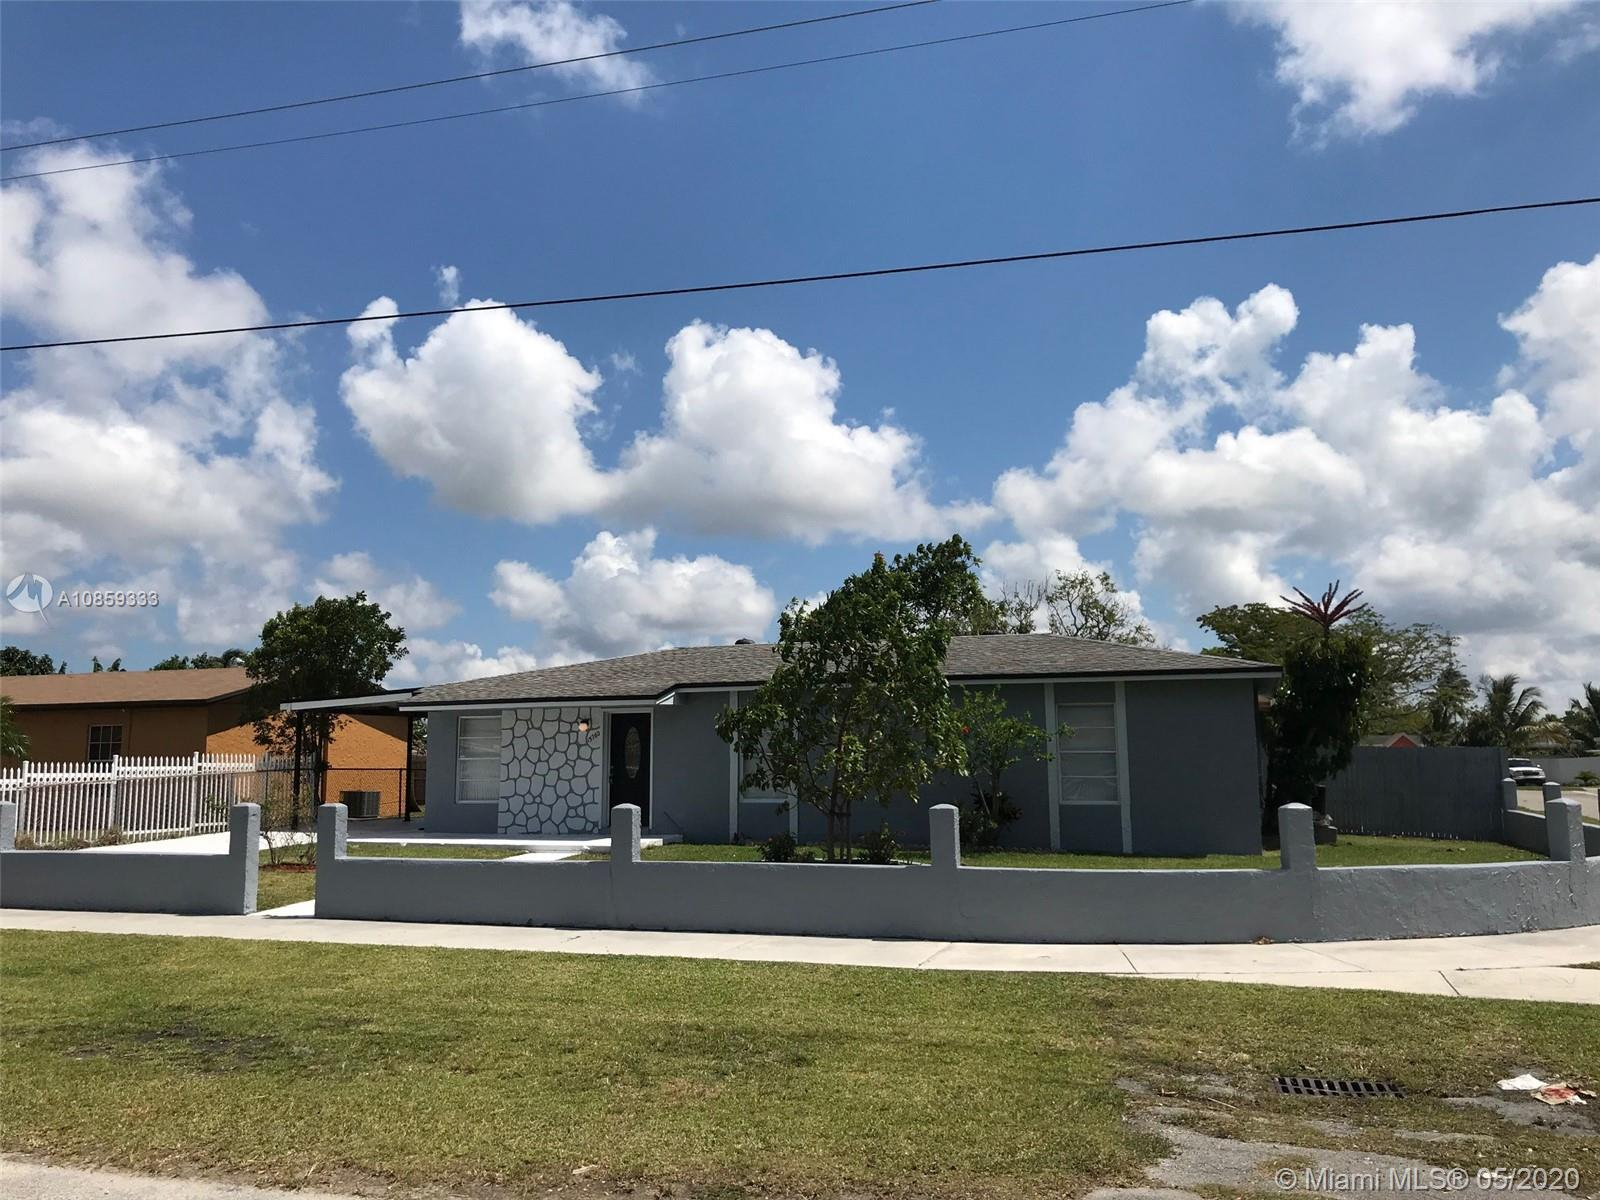 15760 SW 304 ST, Homestead, FL 33033 - Homestead, FL real estate listing